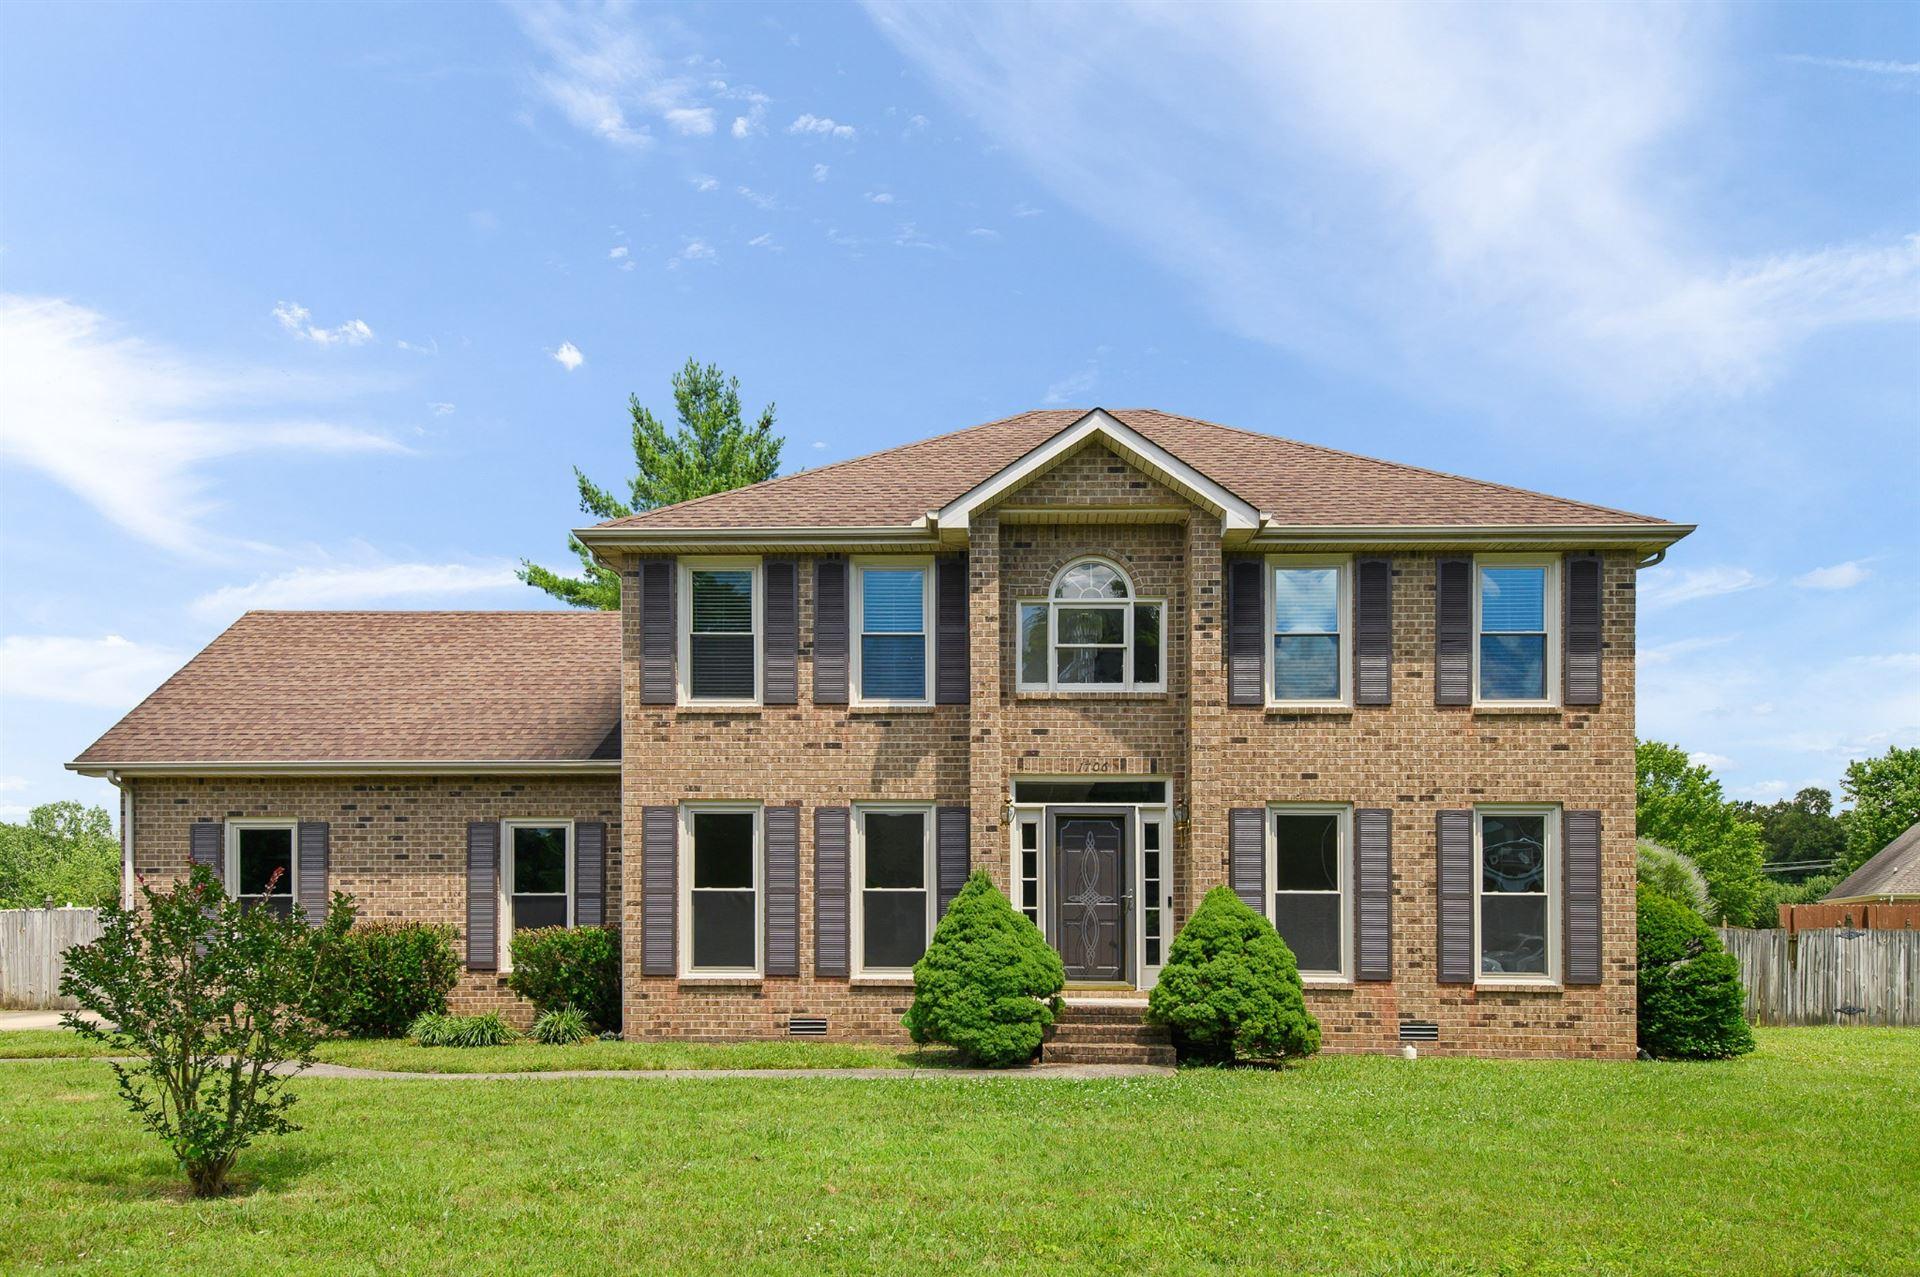 Photo of 1706 Pennington Dr, Murfreesboro, TN 37129 (MLS # 2262560)